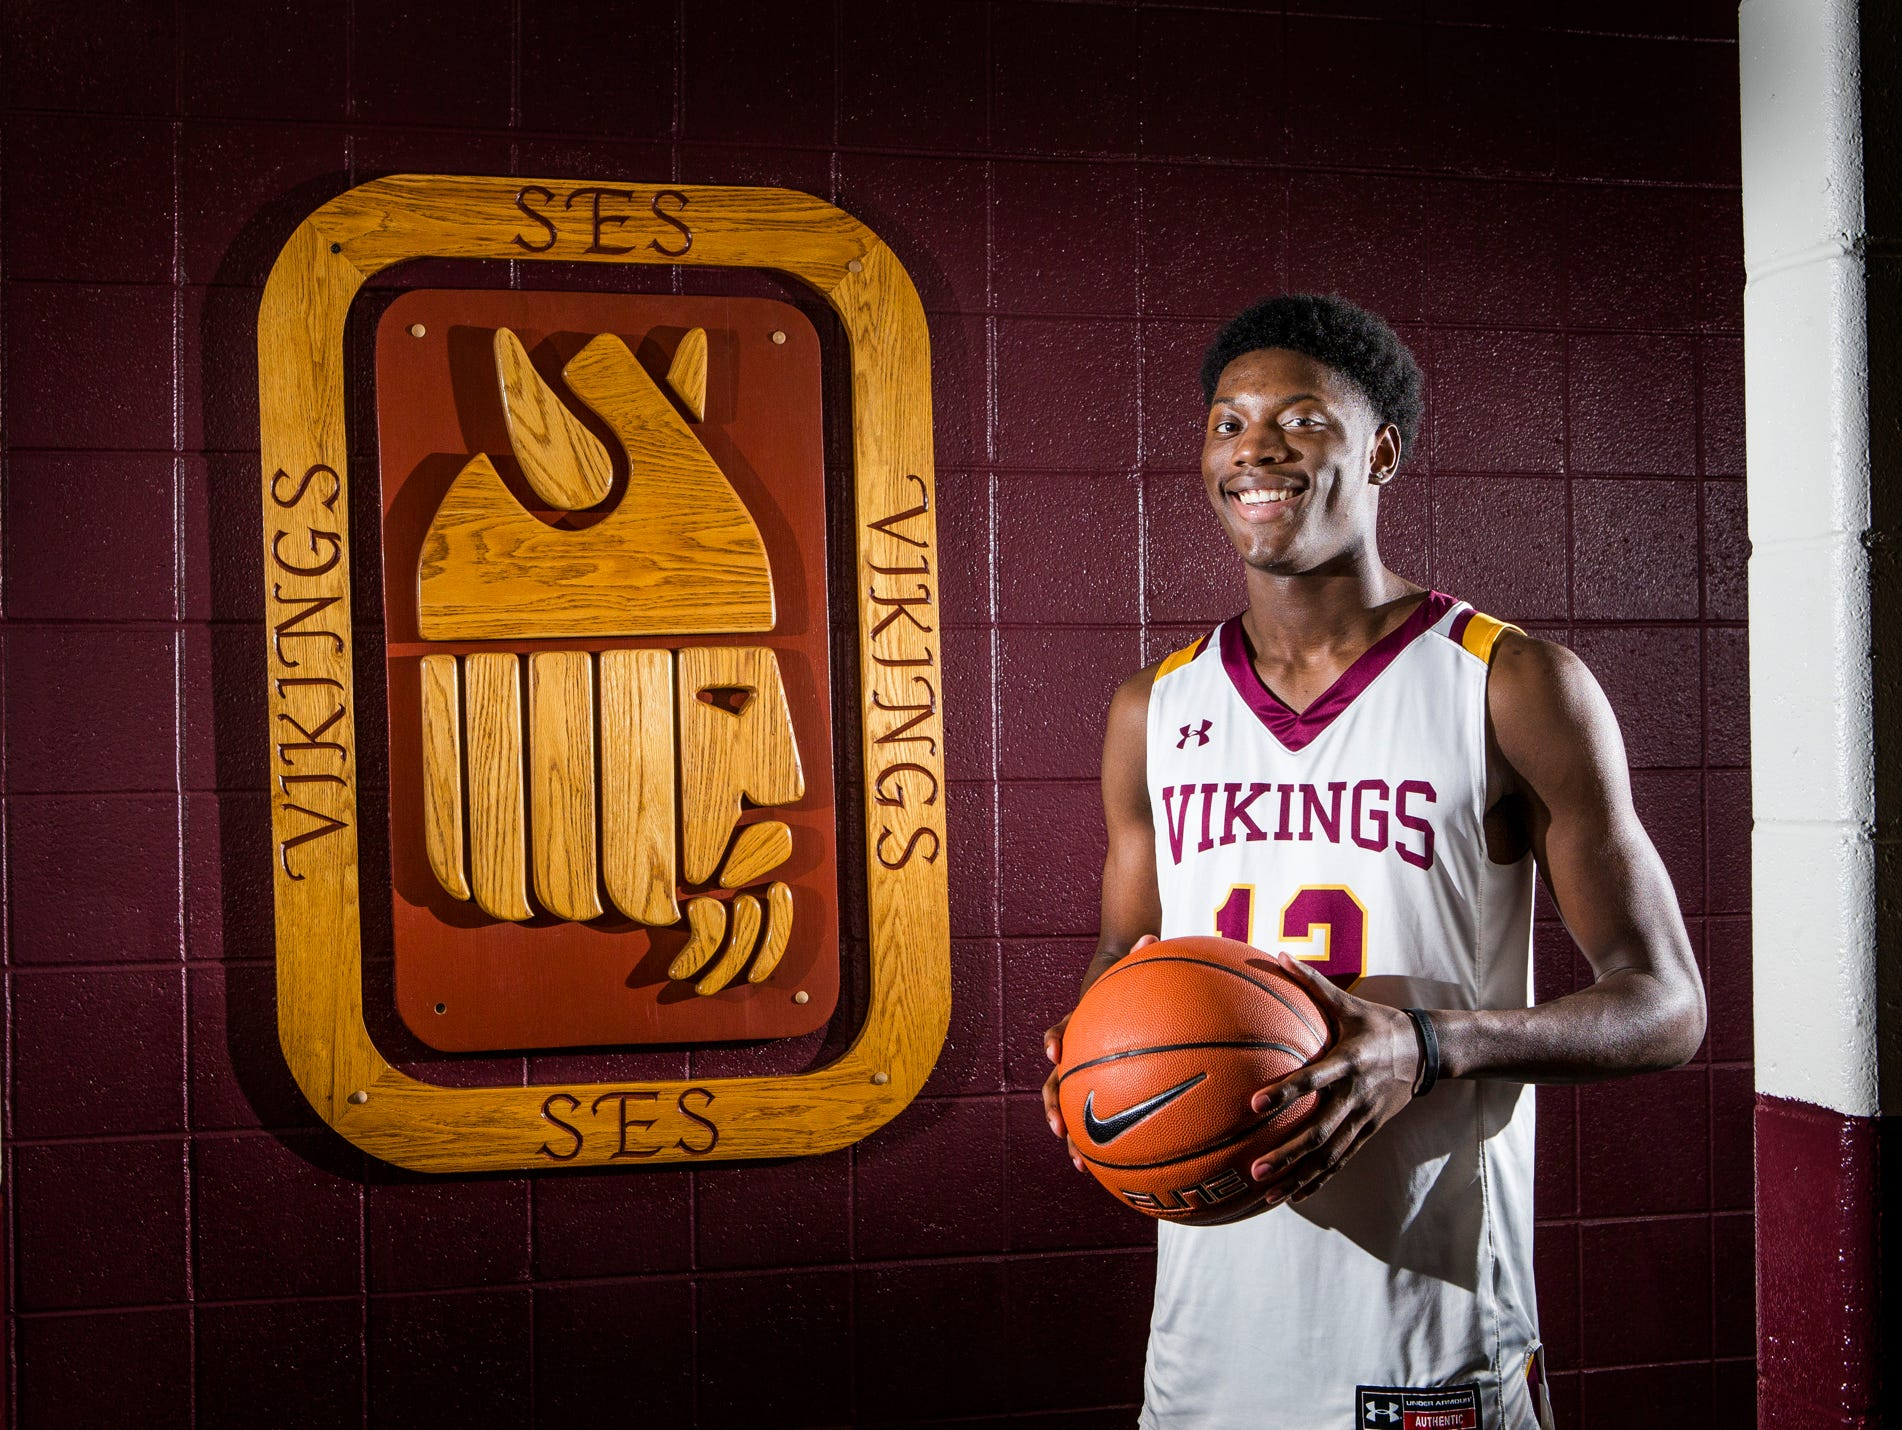 St. Elizabeth boy's basketball guard Jordan Money poses for a portrait in the locker room at St. Elizabeth High School in Wilmington on Monday afternoon.